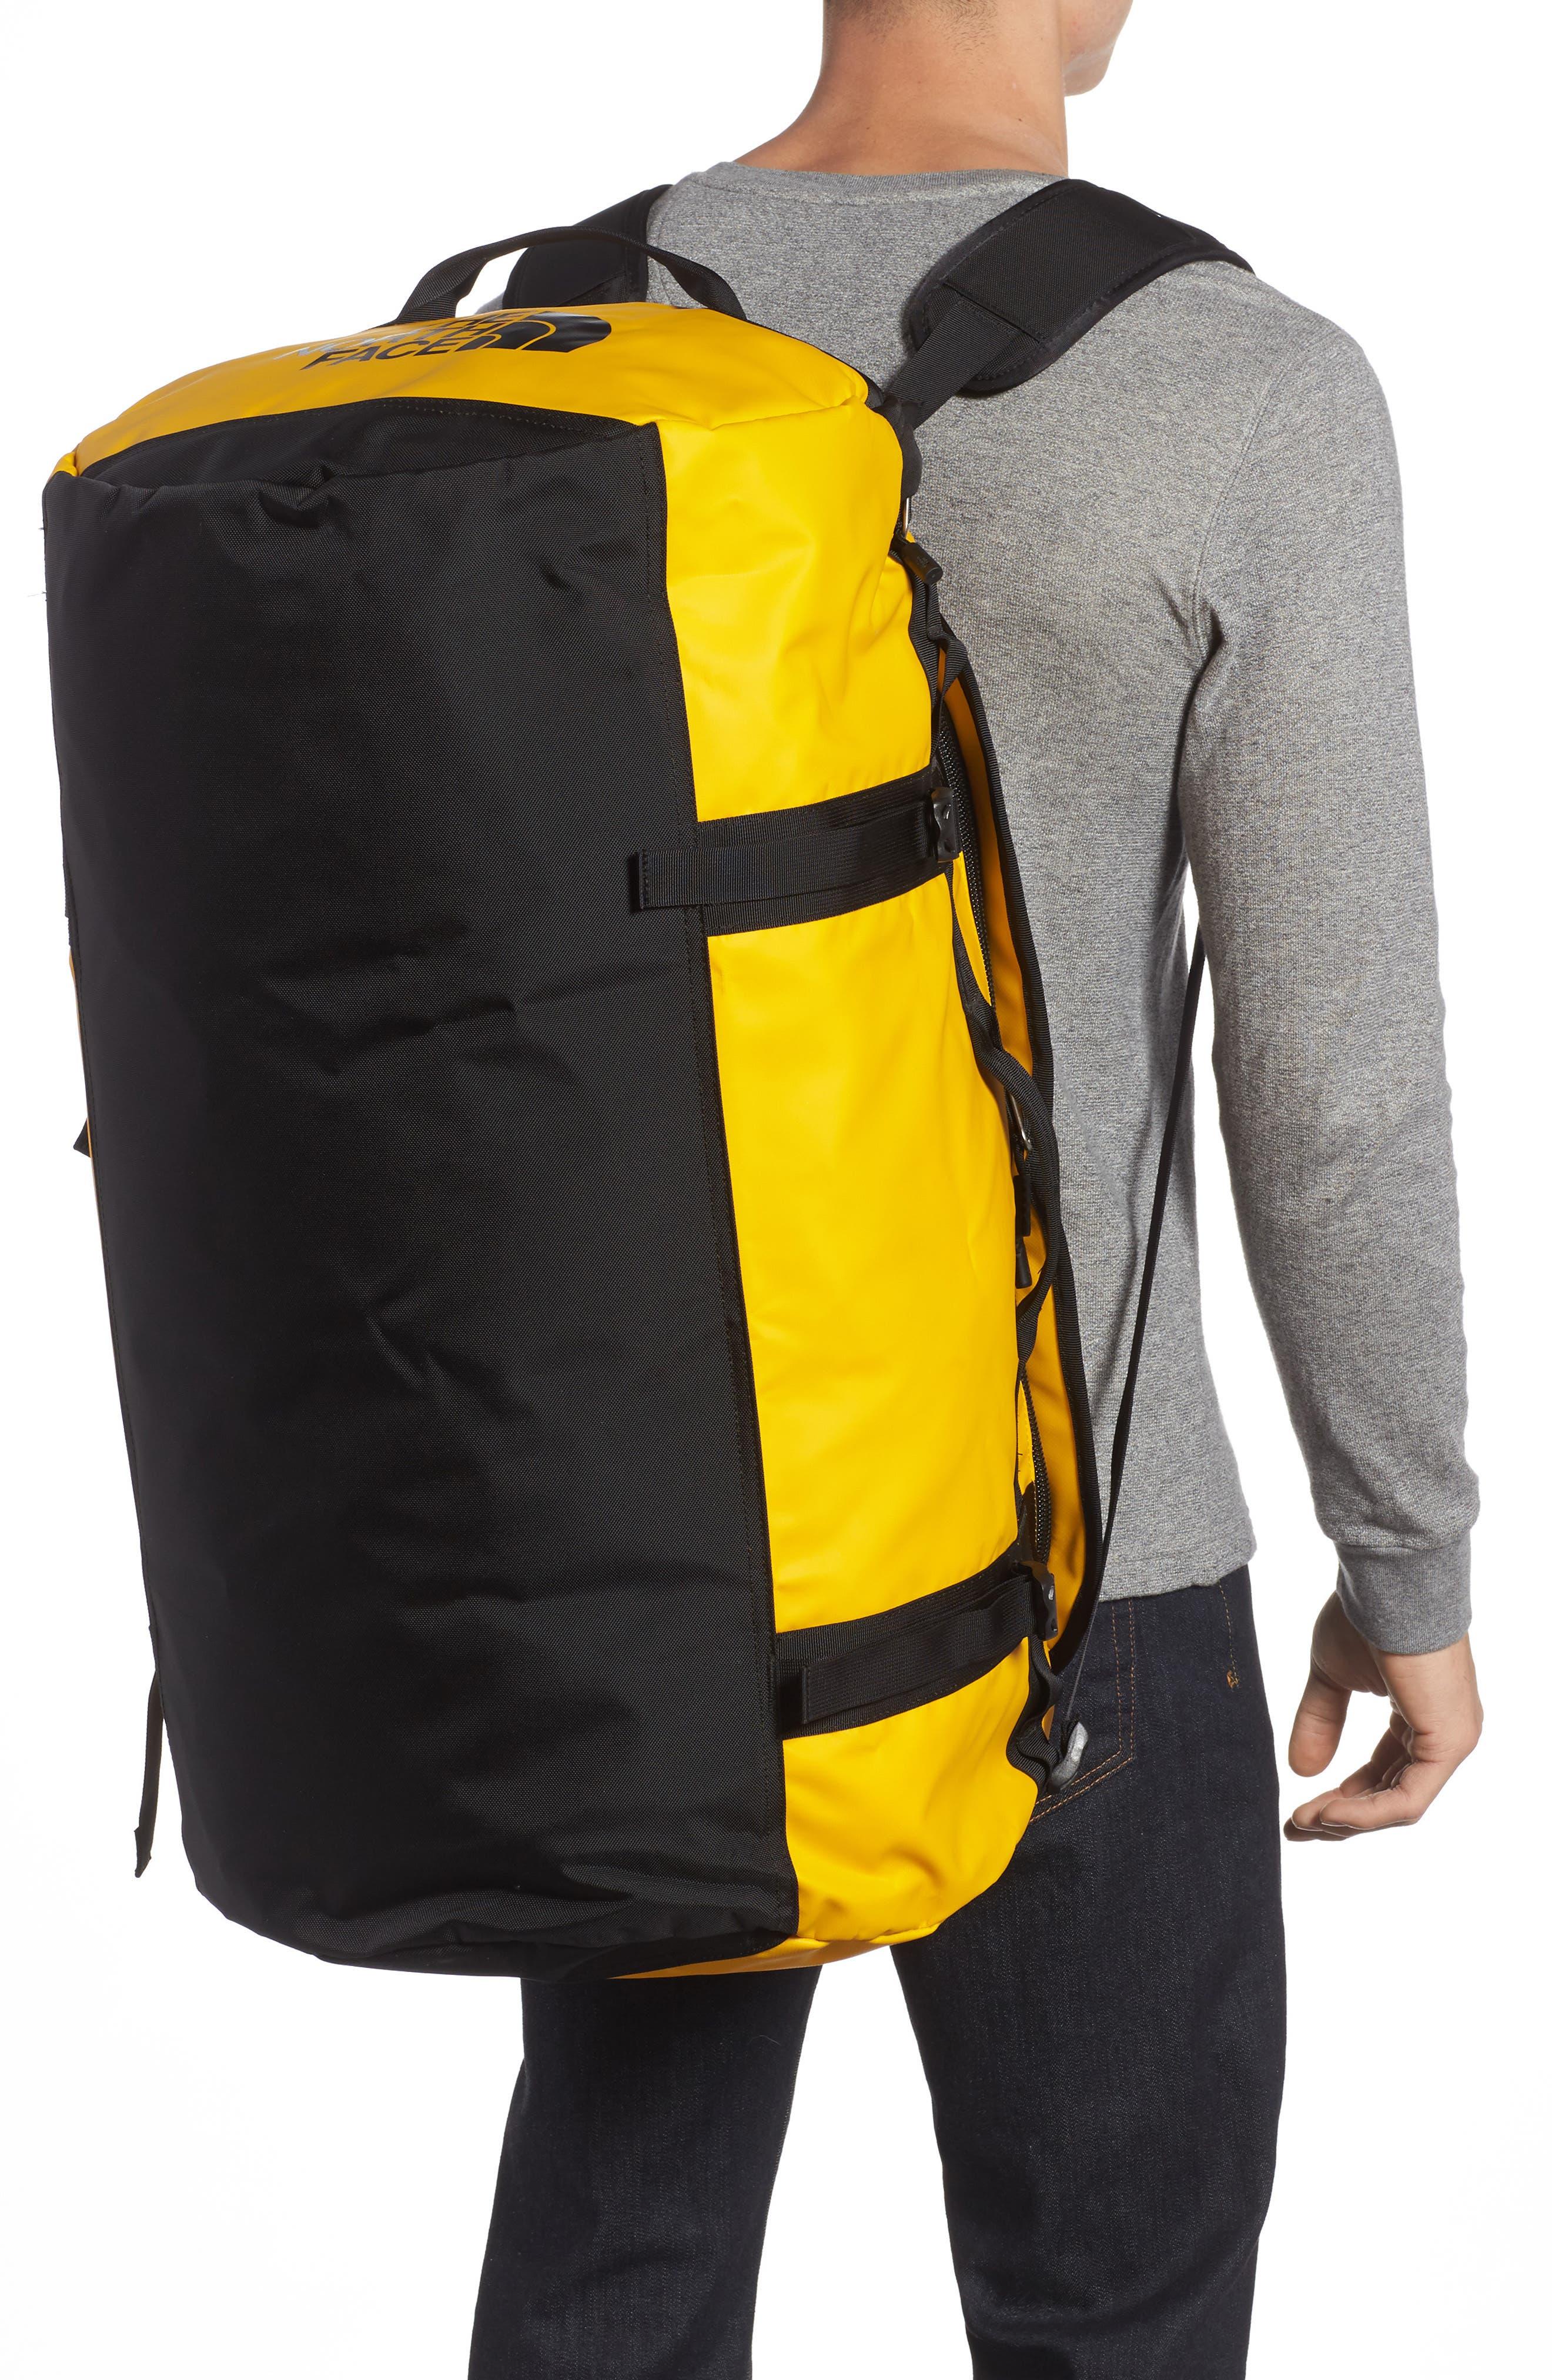 'Base Camp - Large' Duffel Bag,                             Alternate thumbnail 2, color,                             710